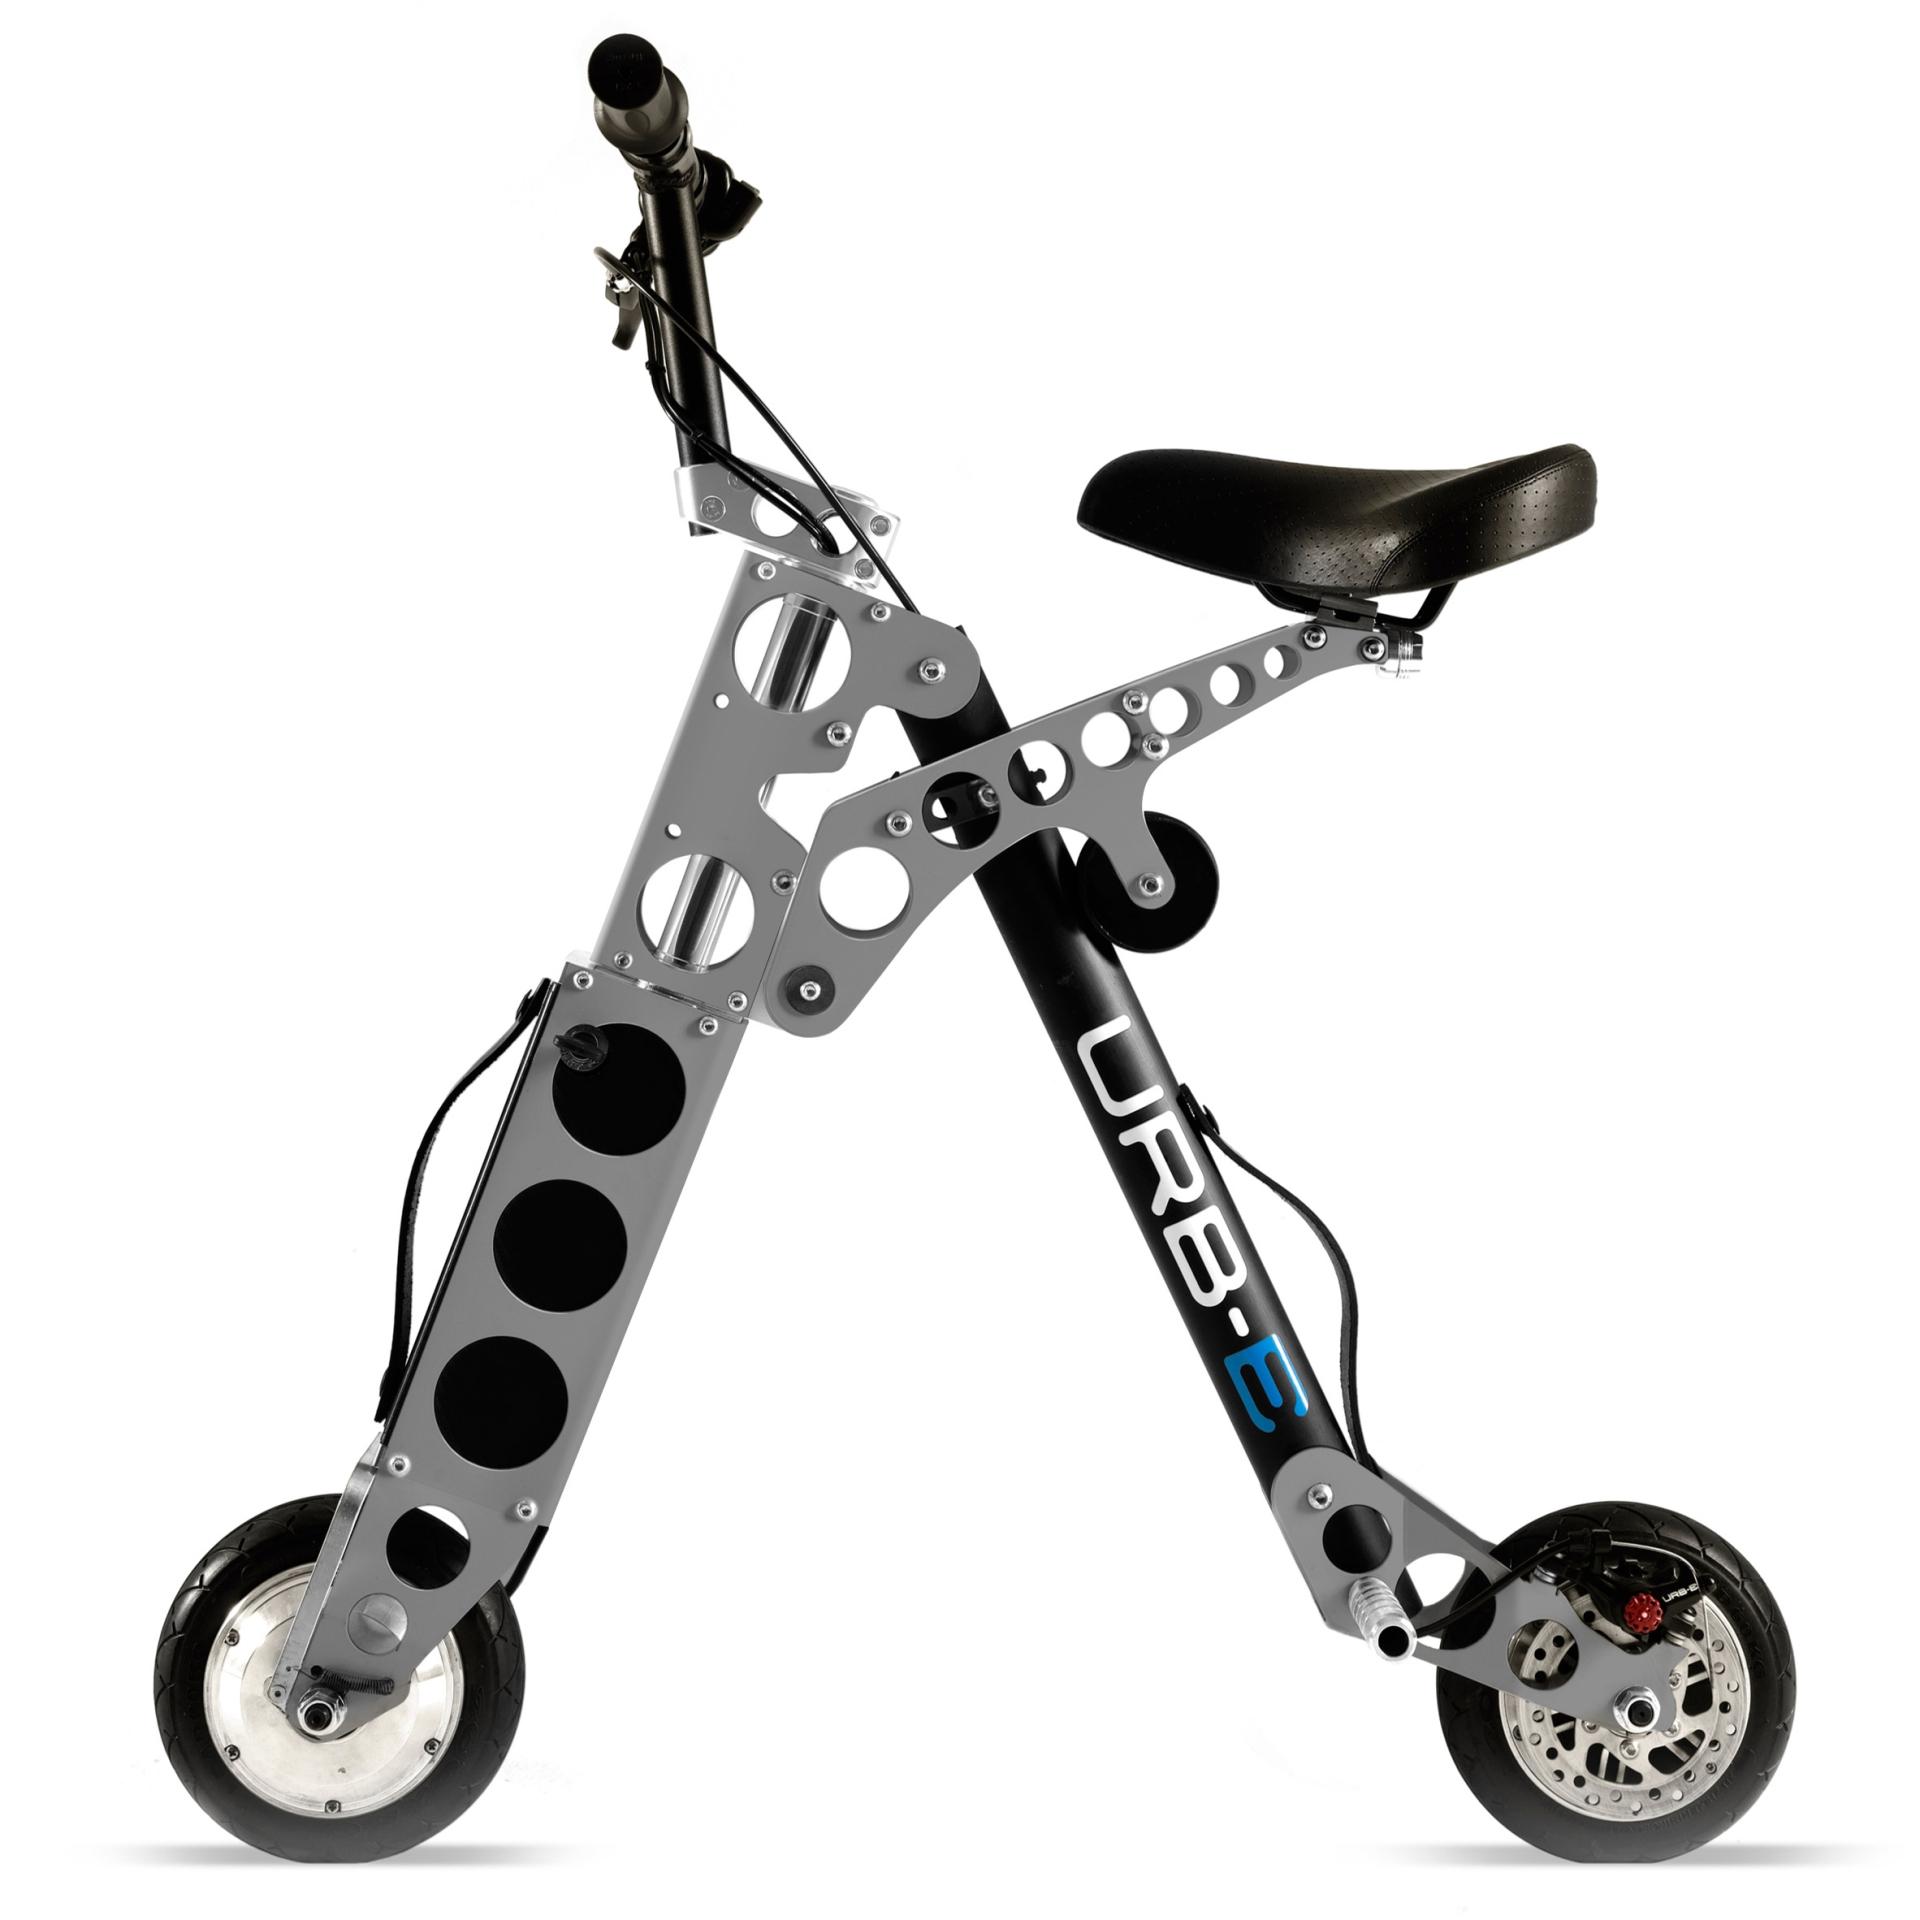 urb-e-scooter-design-transport-electric-vehicles-ces_dezeen_2364_col_12